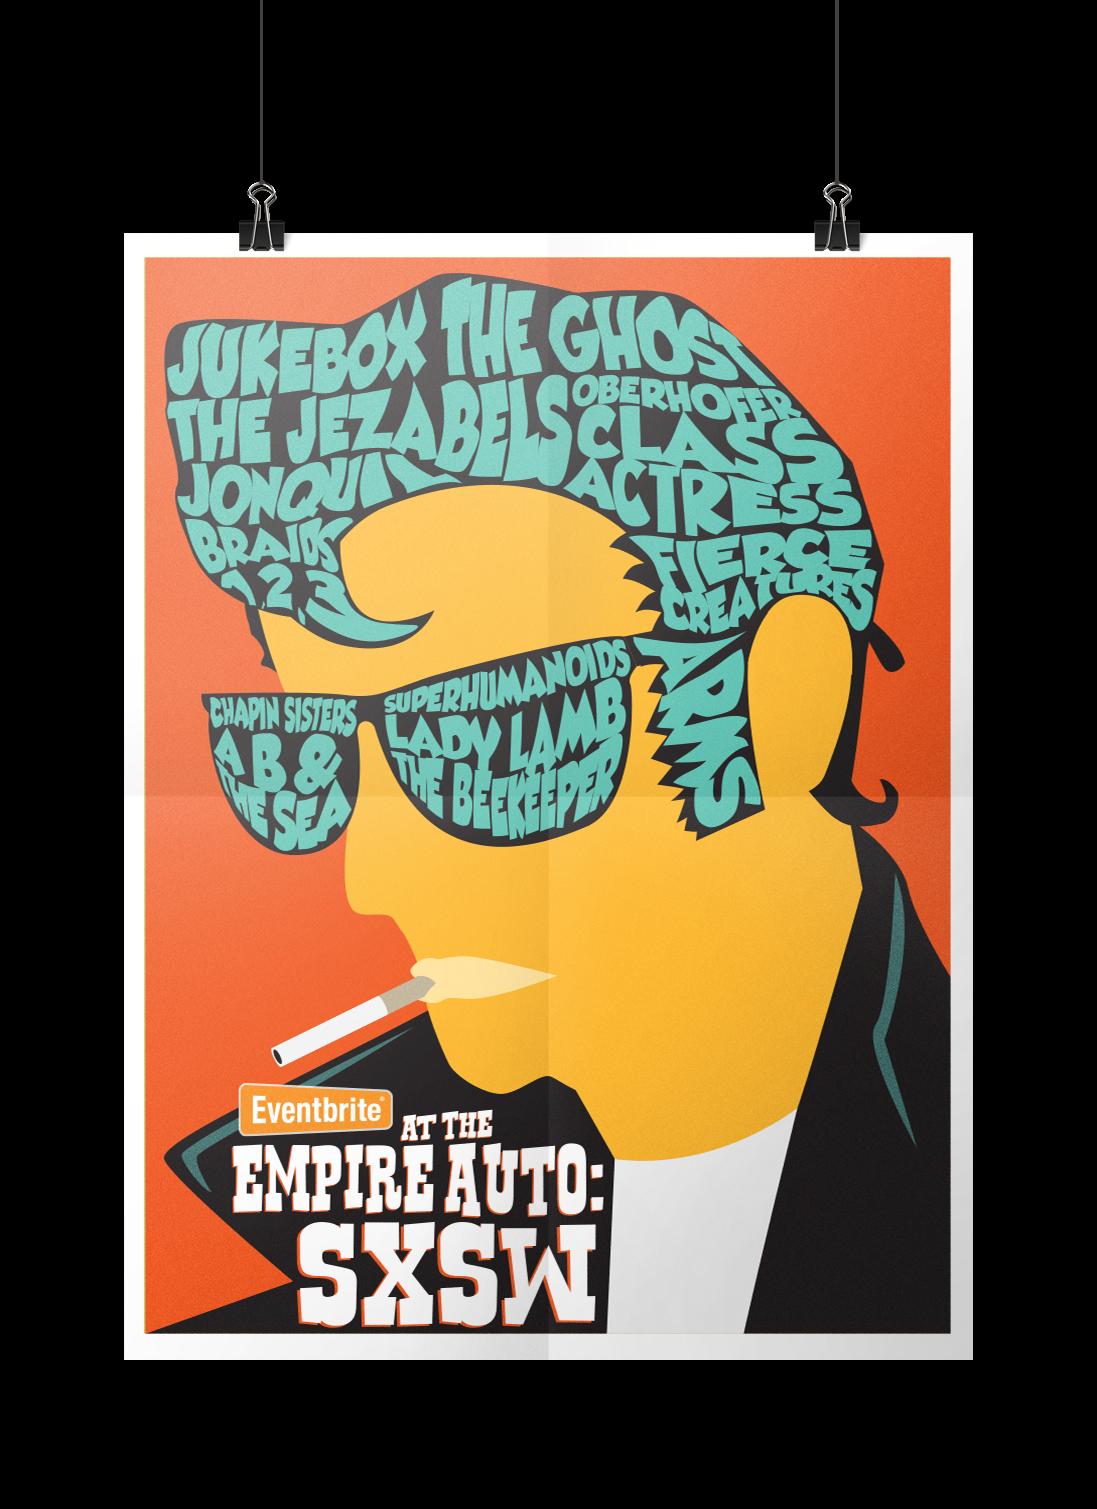 Eventbrite SXSW Poster